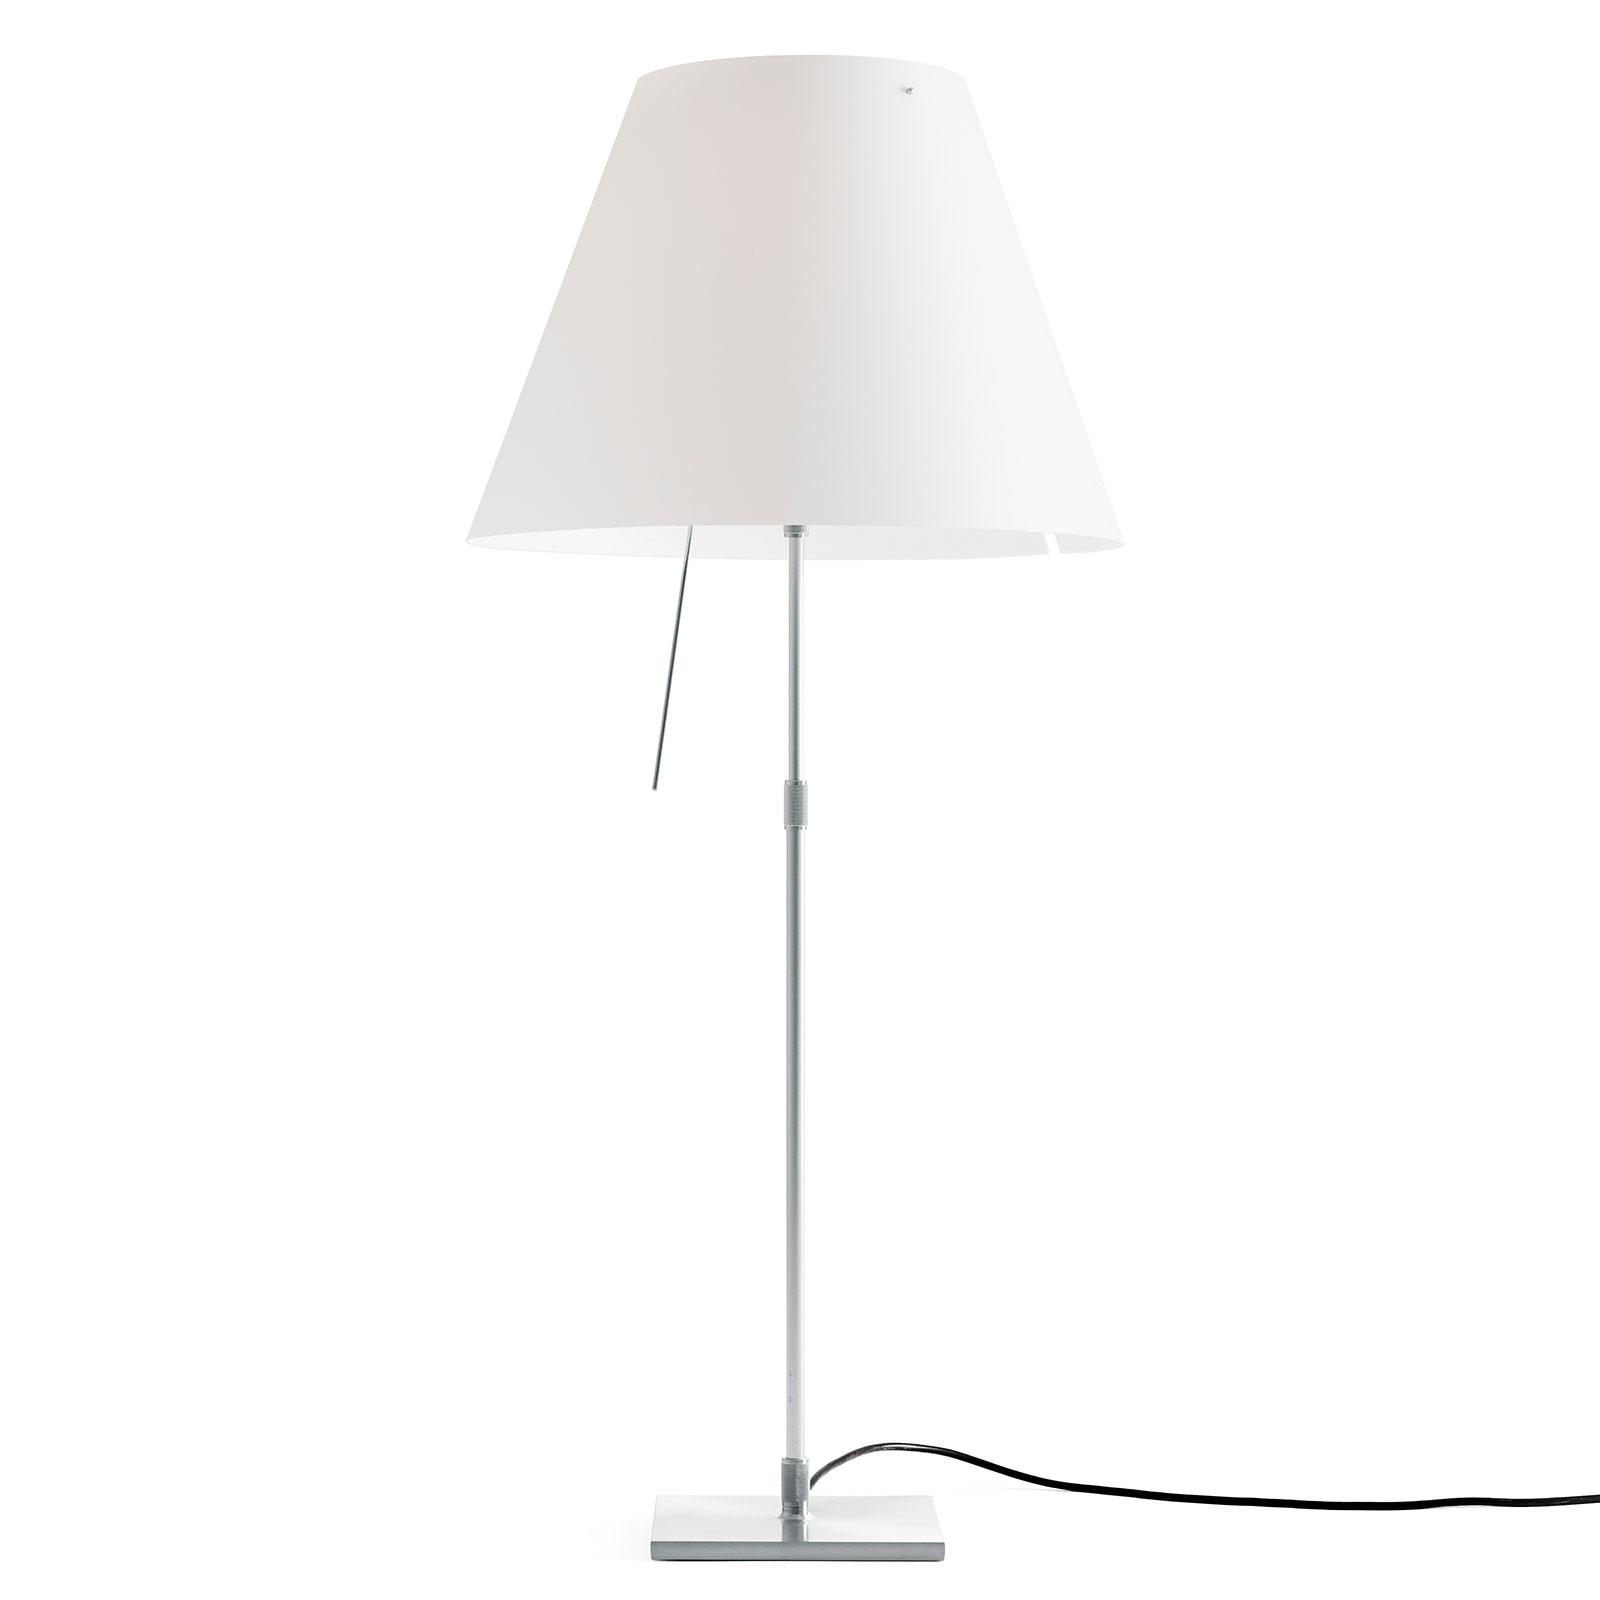 Luceplan Costanza tafellamp alu wit met diffusor